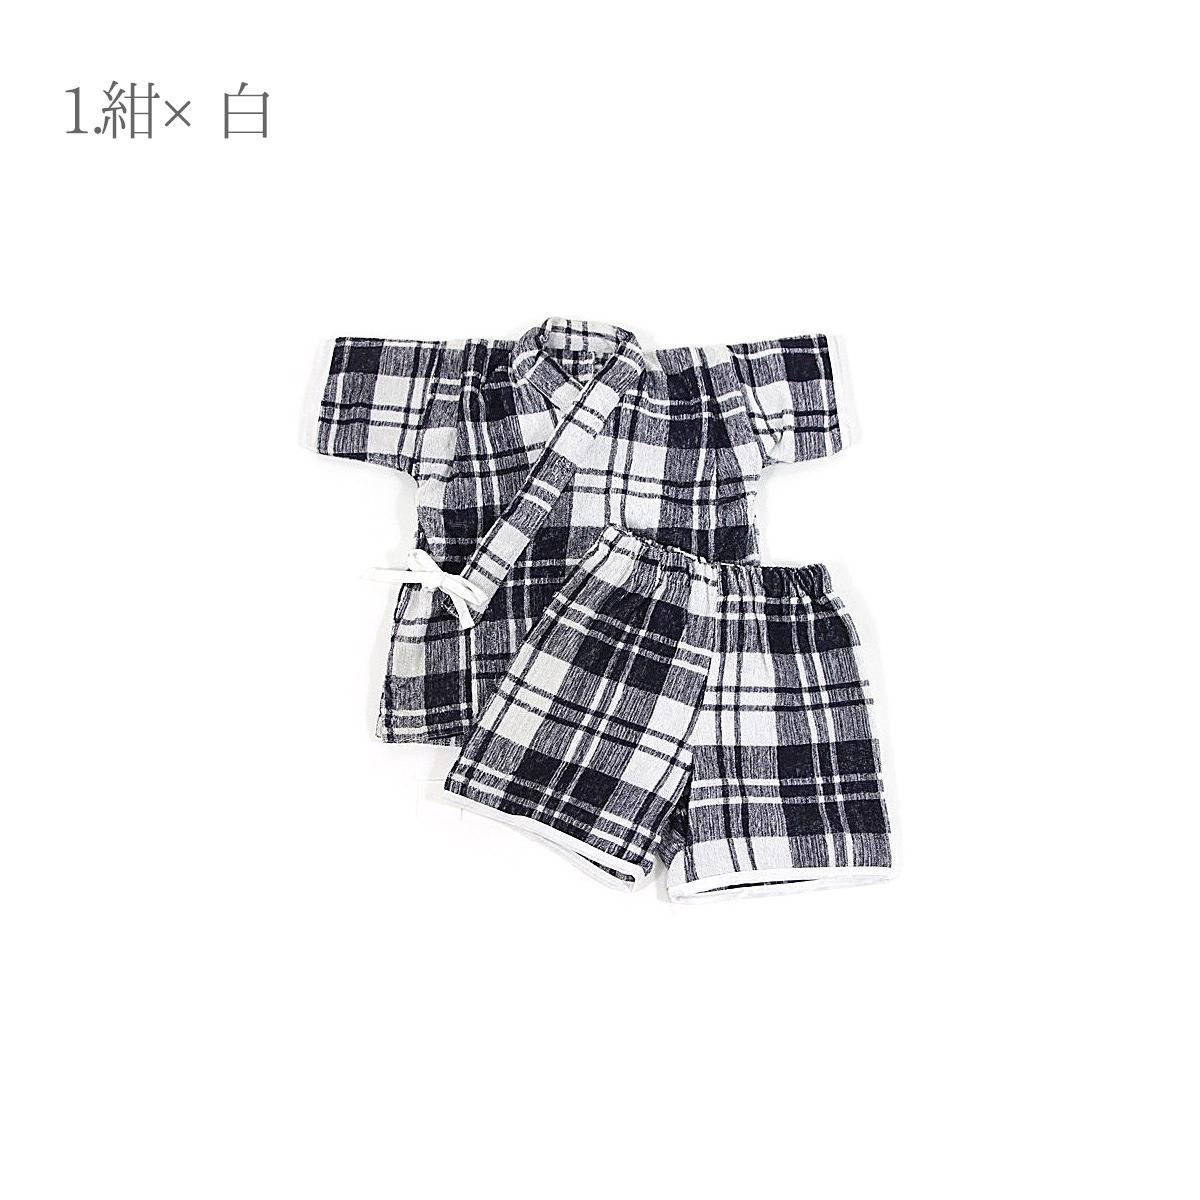 3c24f474cb9f Yasuuritengoku Tosen  The pajamas impossibility that everyday wear ...